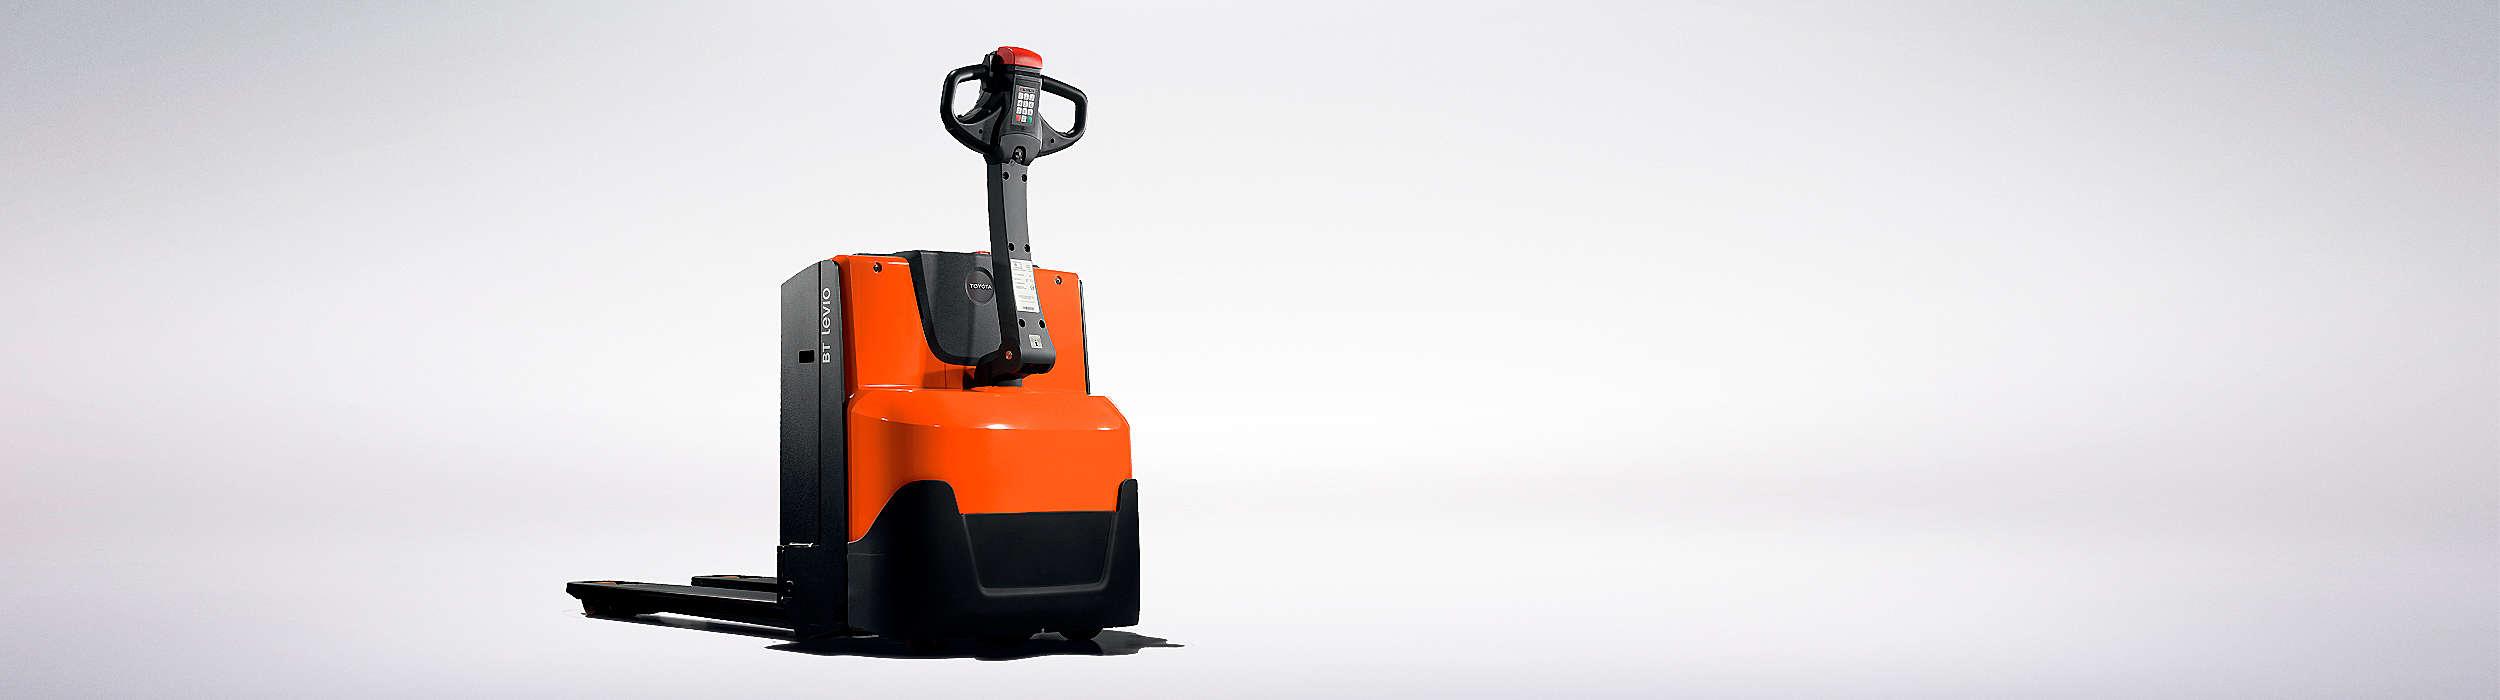 BT Levio Walkie series - easy to use.